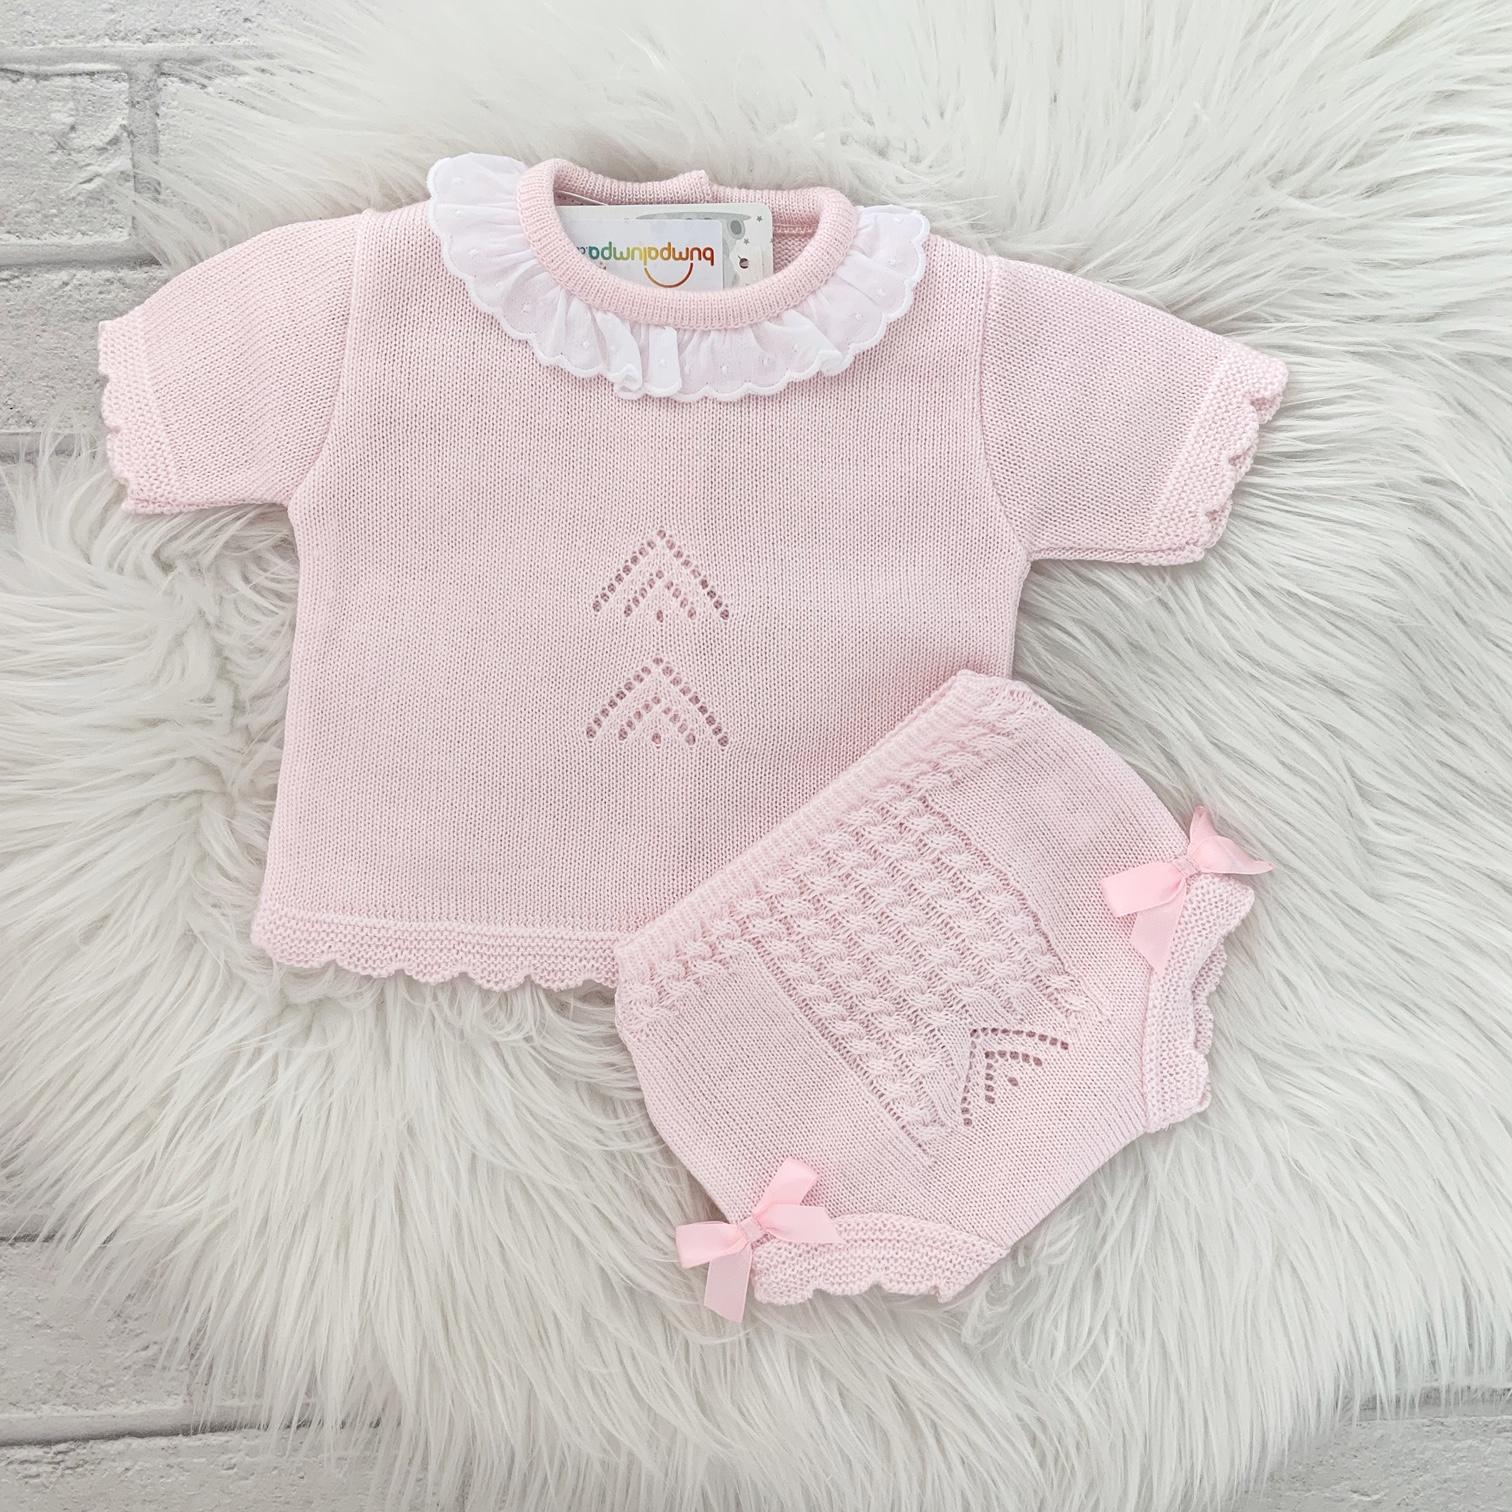 Baby Girls Pink Short Sleeve Top & Shorts Set